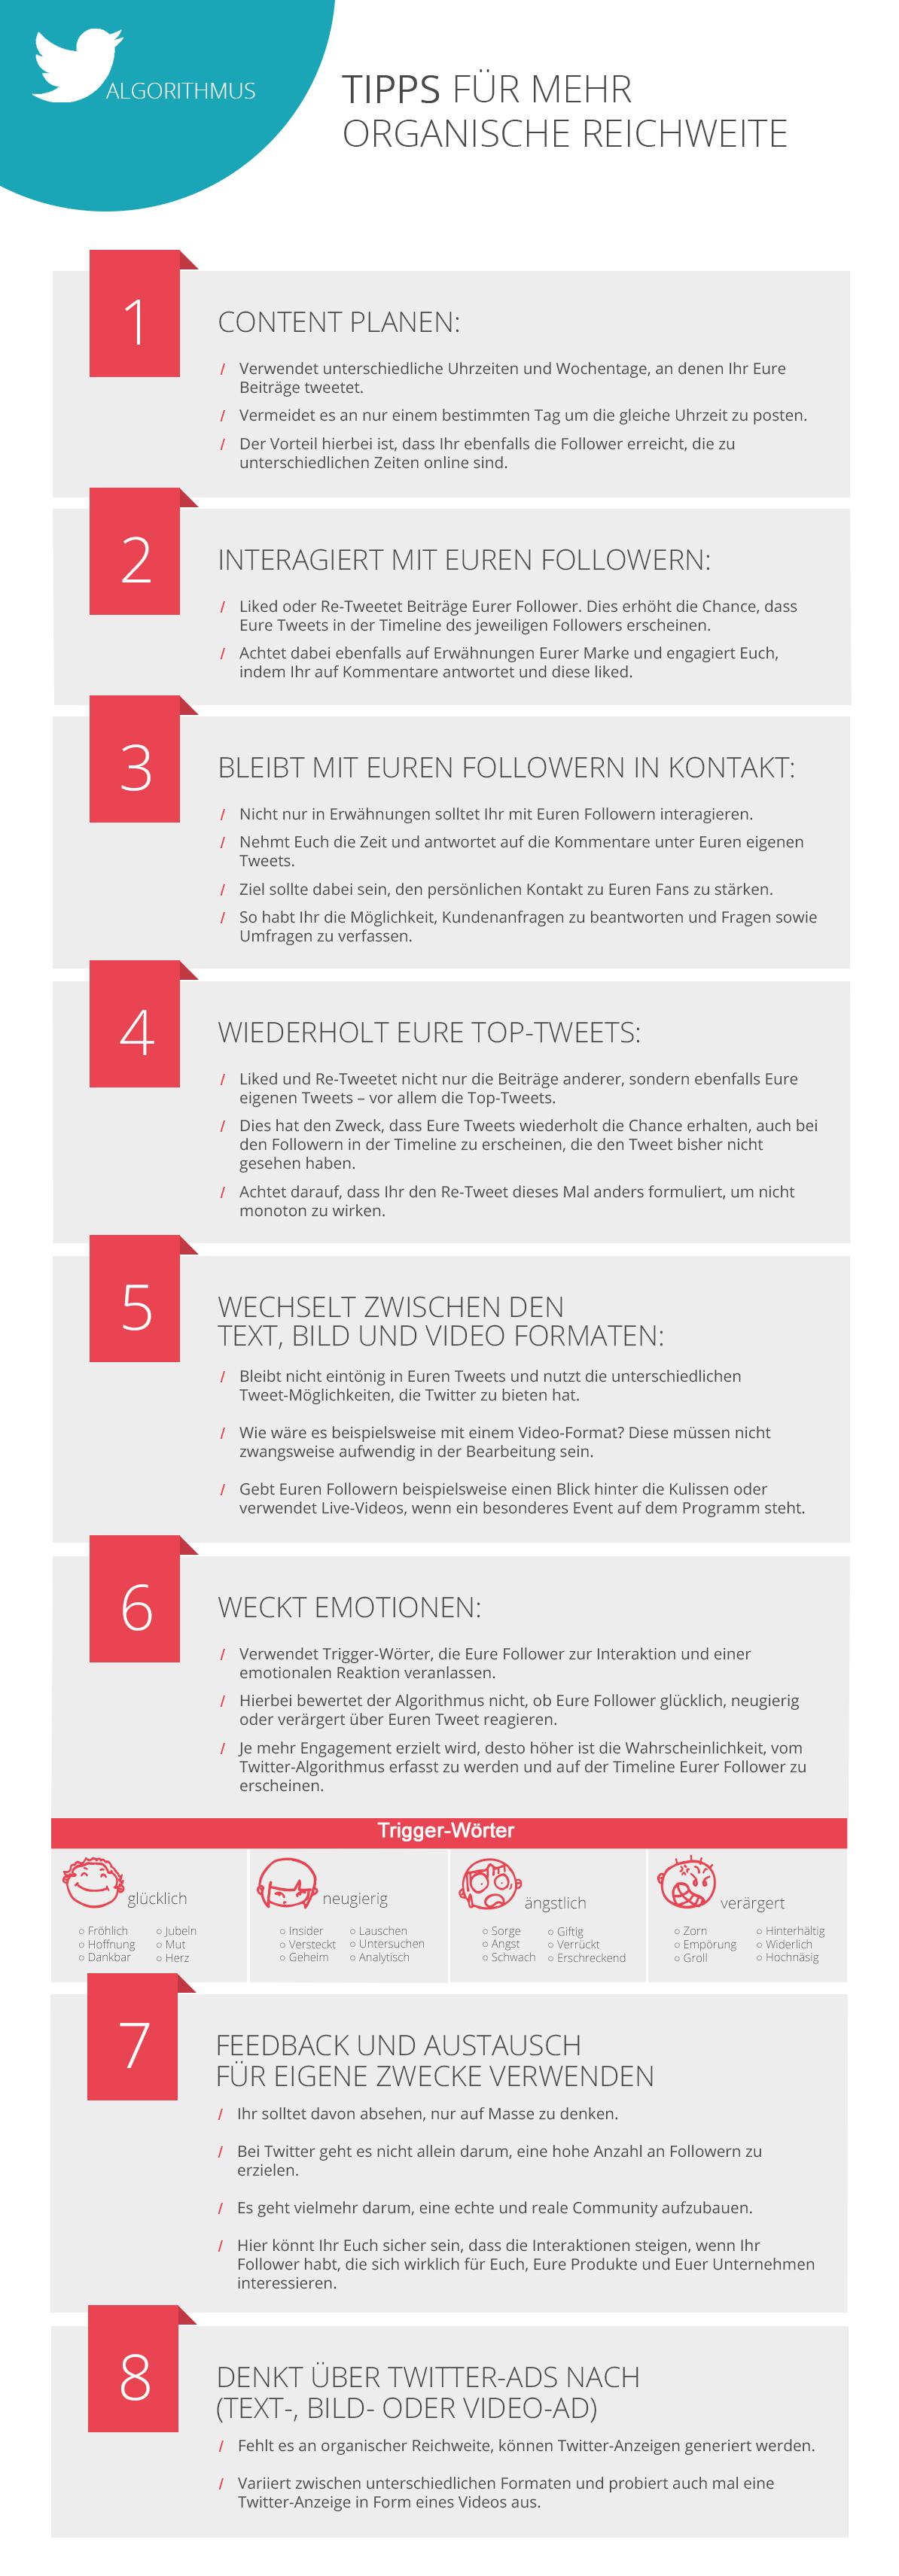 Twitter;Twitter Algorithmus; Tipps